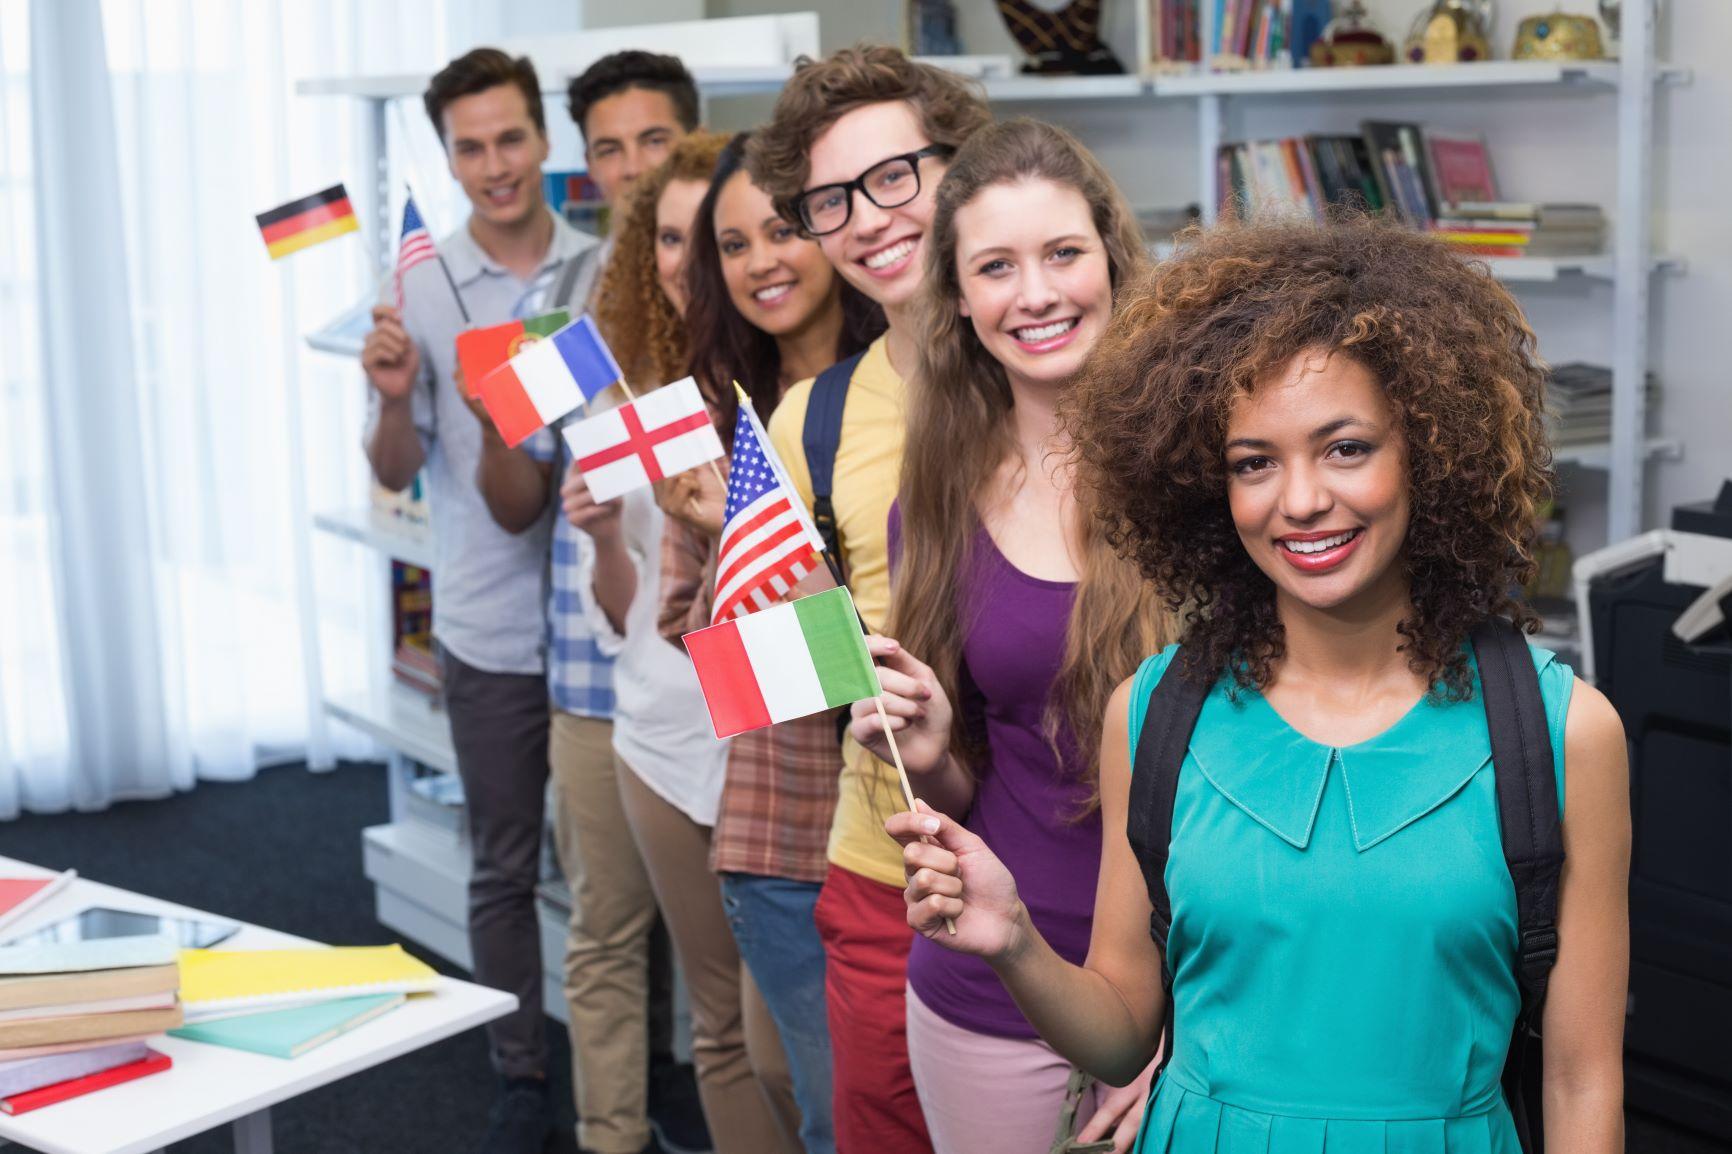 International students at M&S Schools